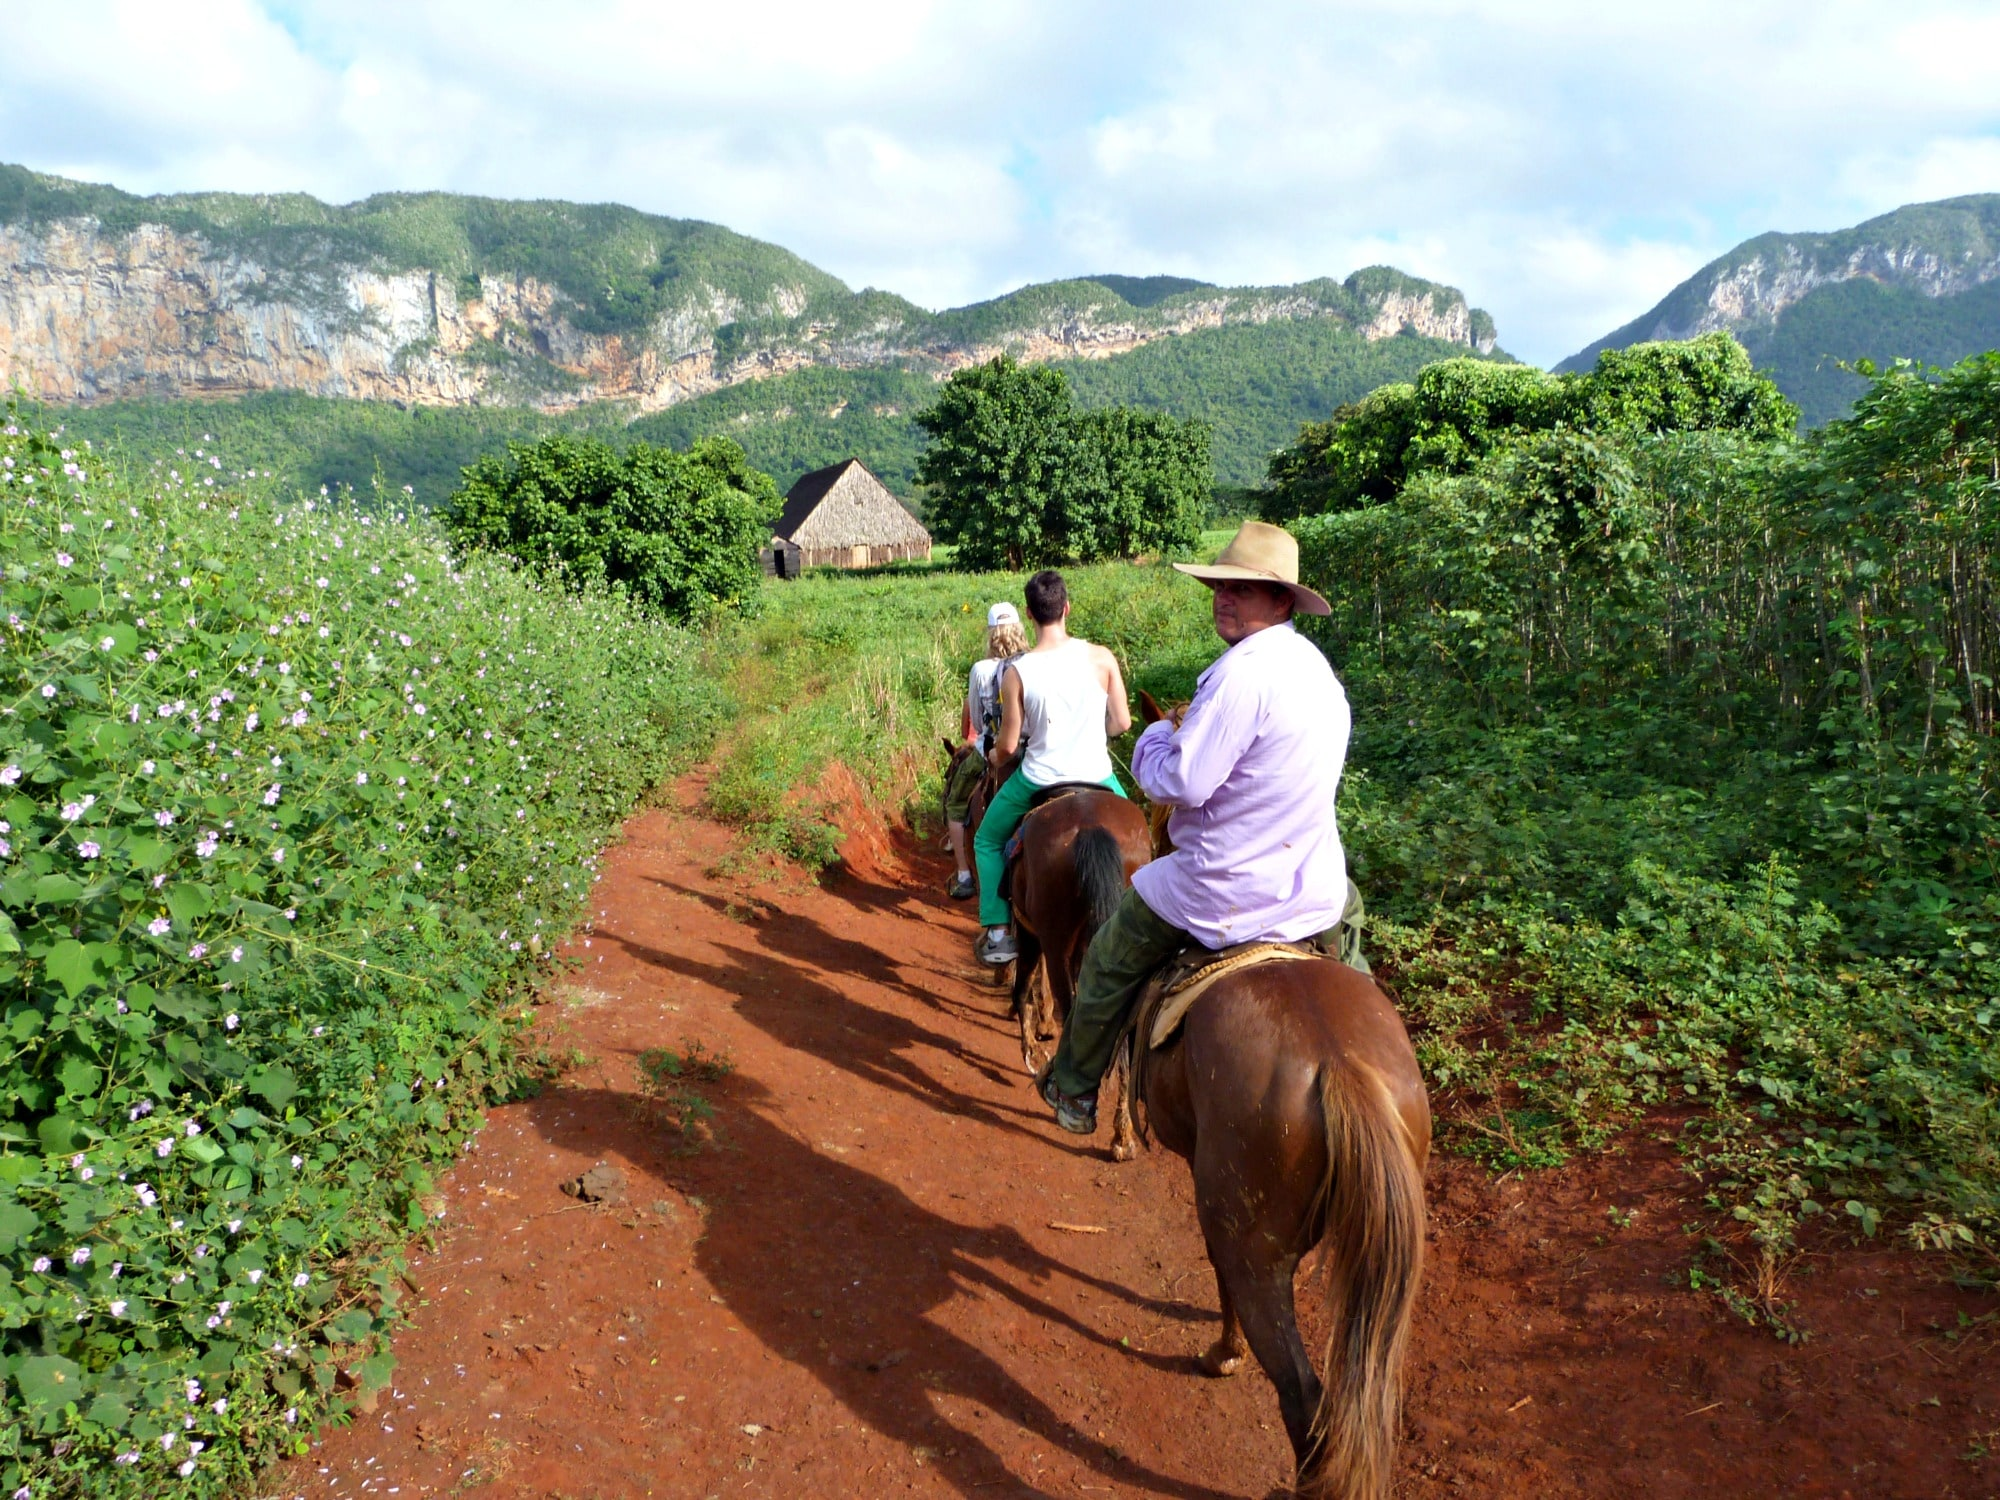 excursion-caballo-vinales-cuba-2